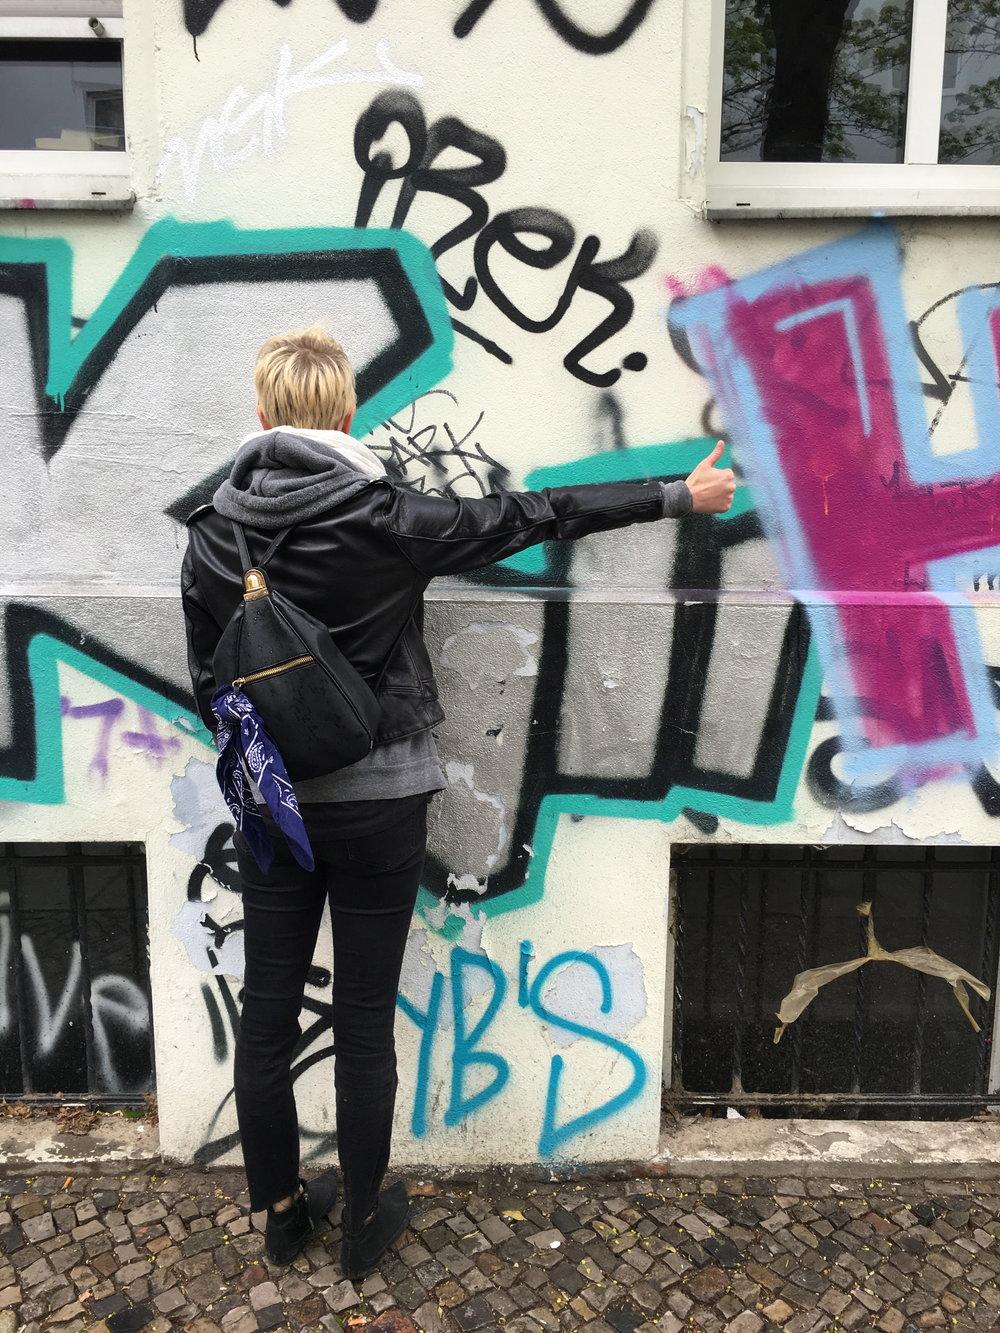 Kreuzberg, Berlin / Germany | Copyright Alexis Rockley, Local (Tourist)